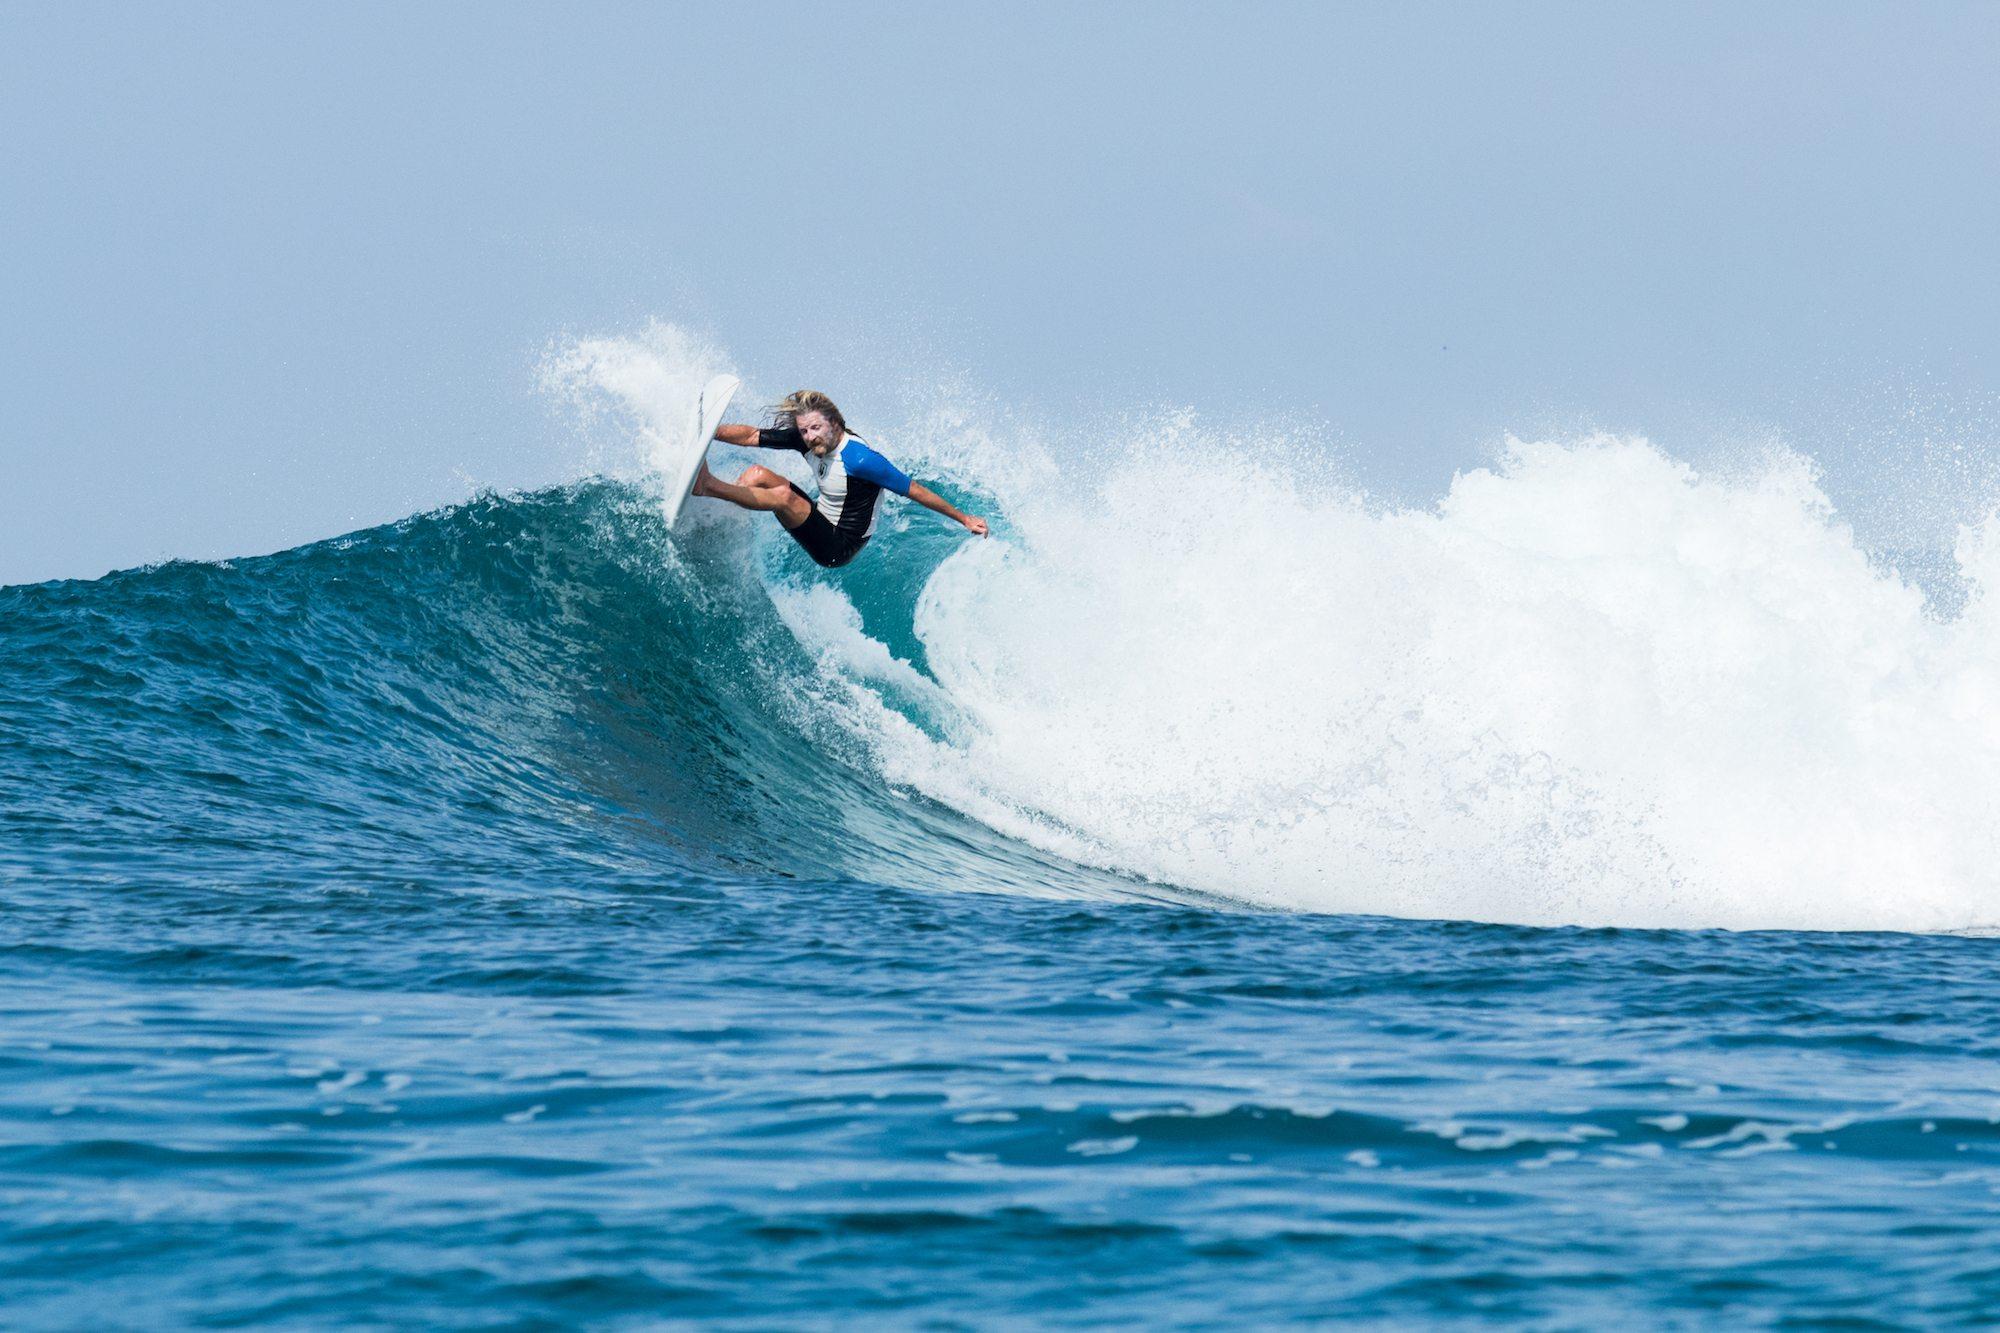 baz the peak surfer's stunt, surf banyak